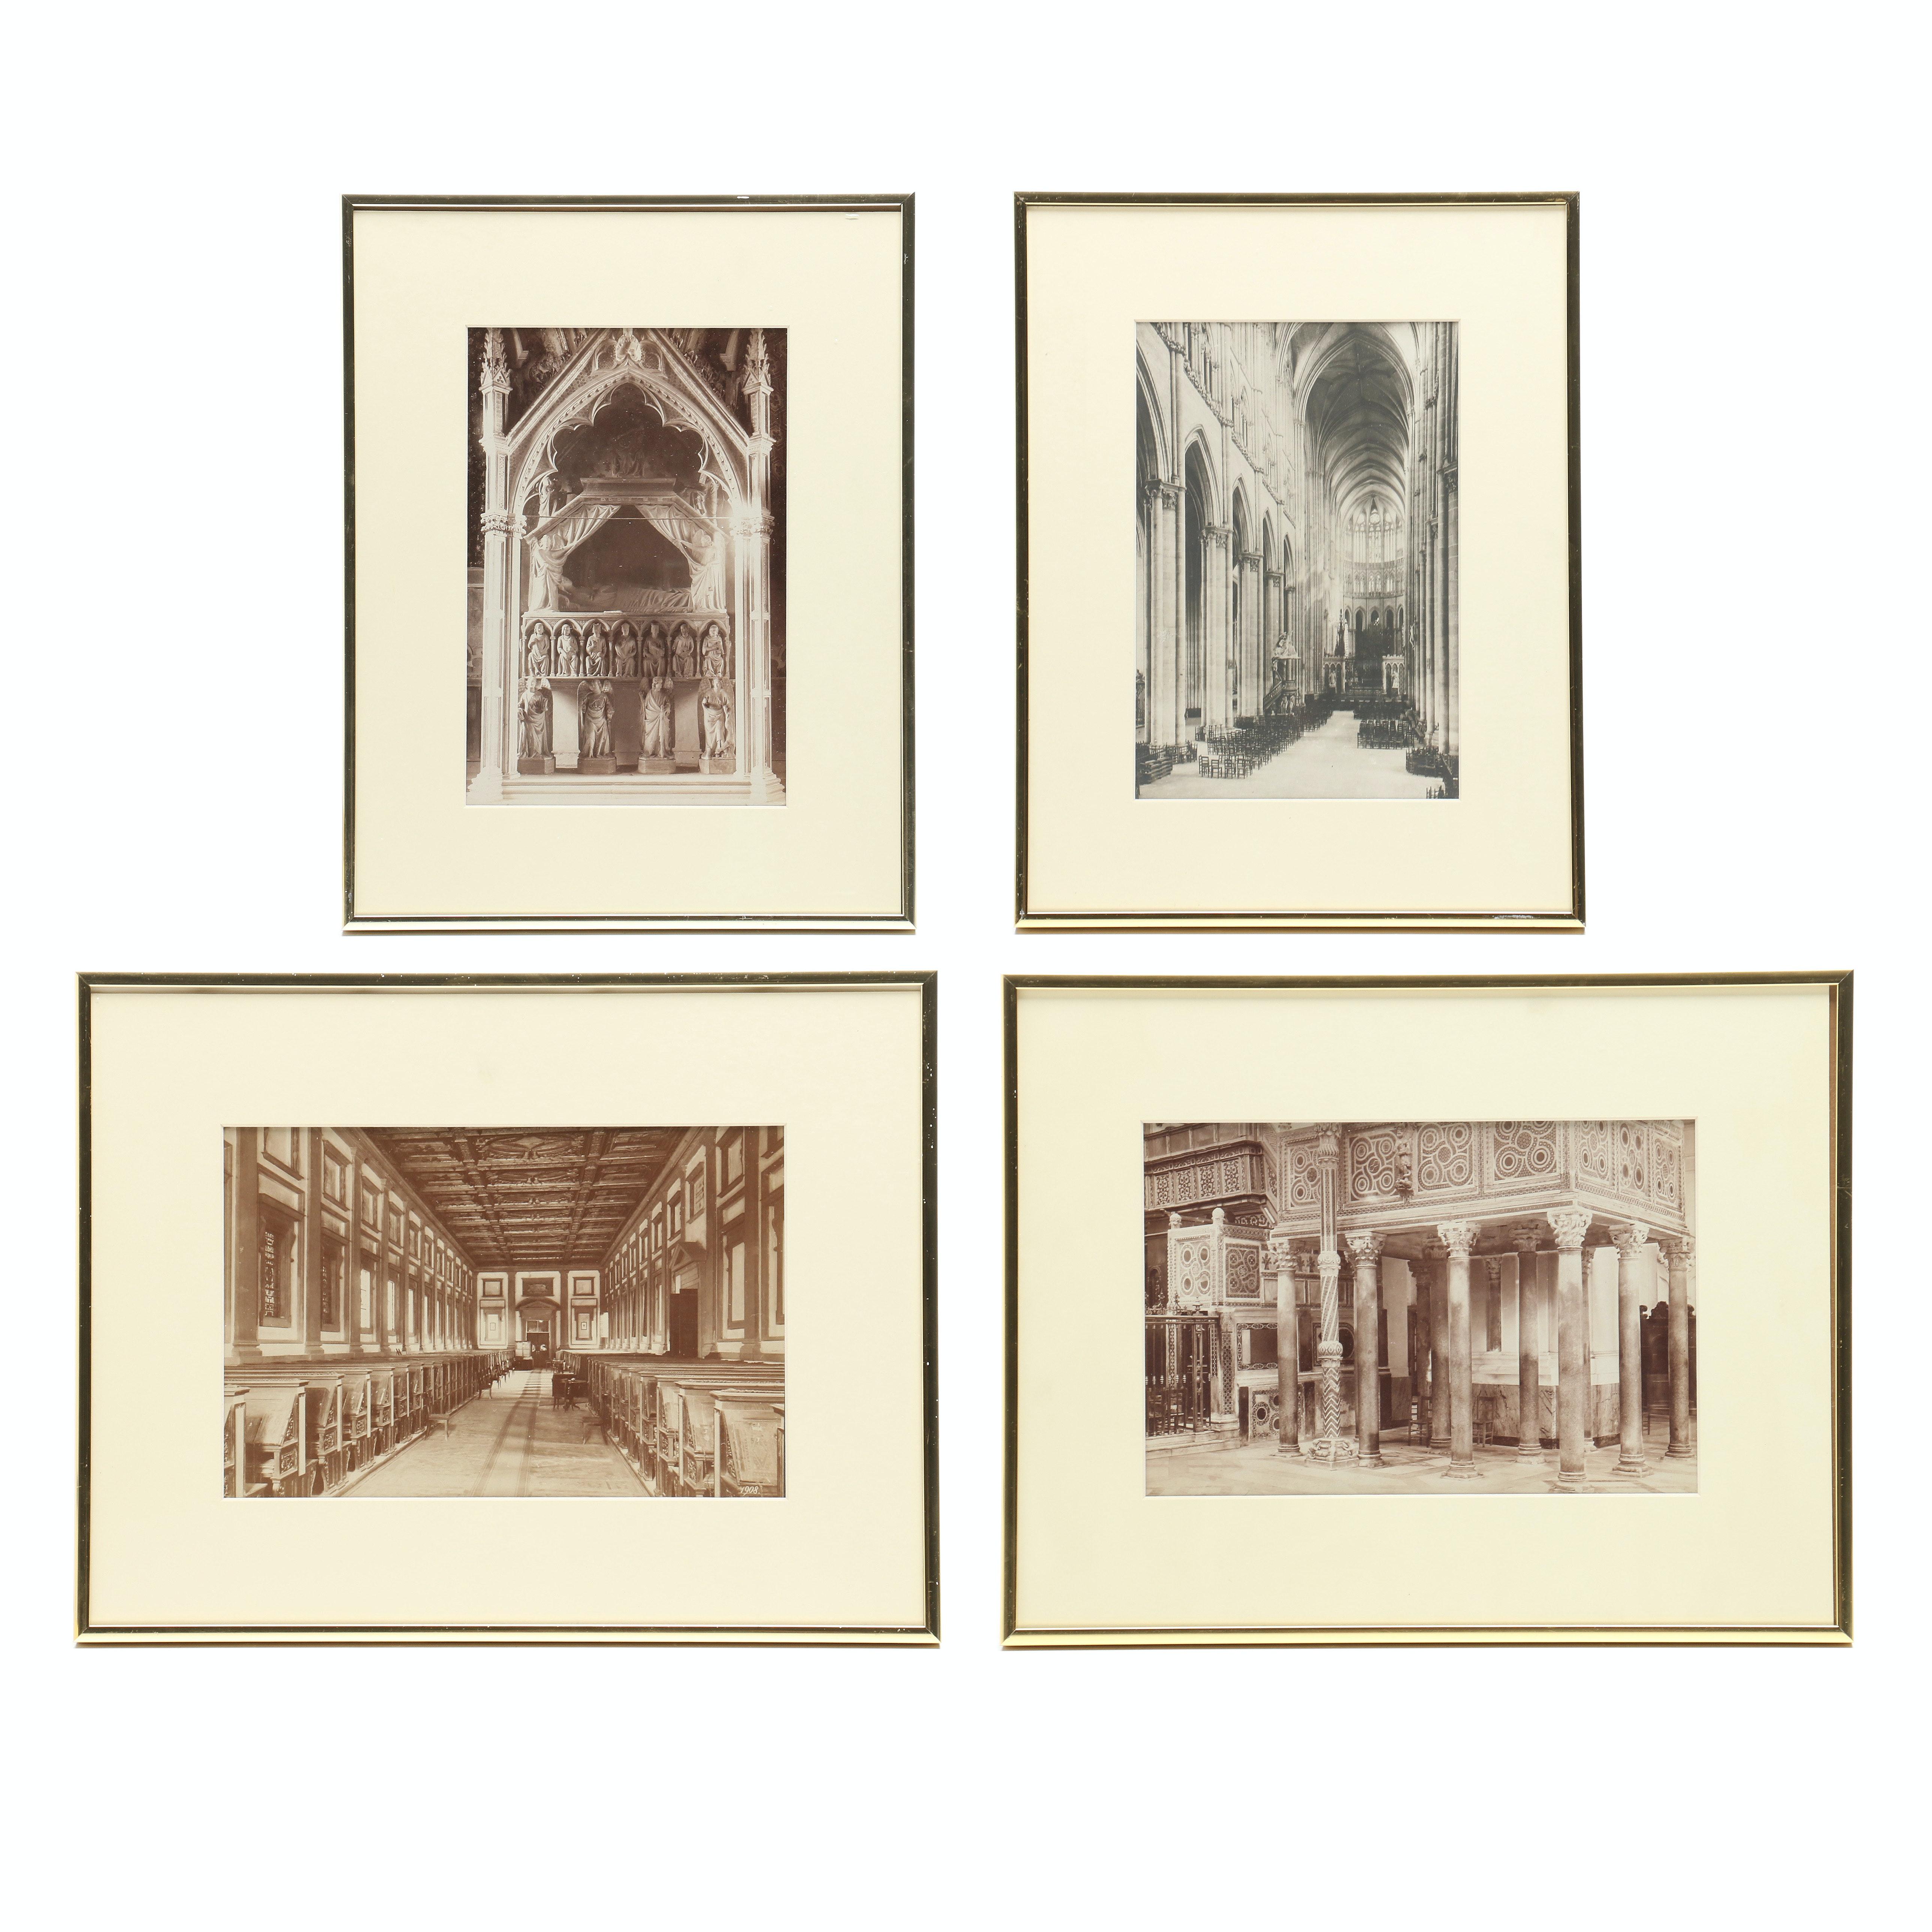 Four Silver Gelatin Photographs of European Architectural Interiors